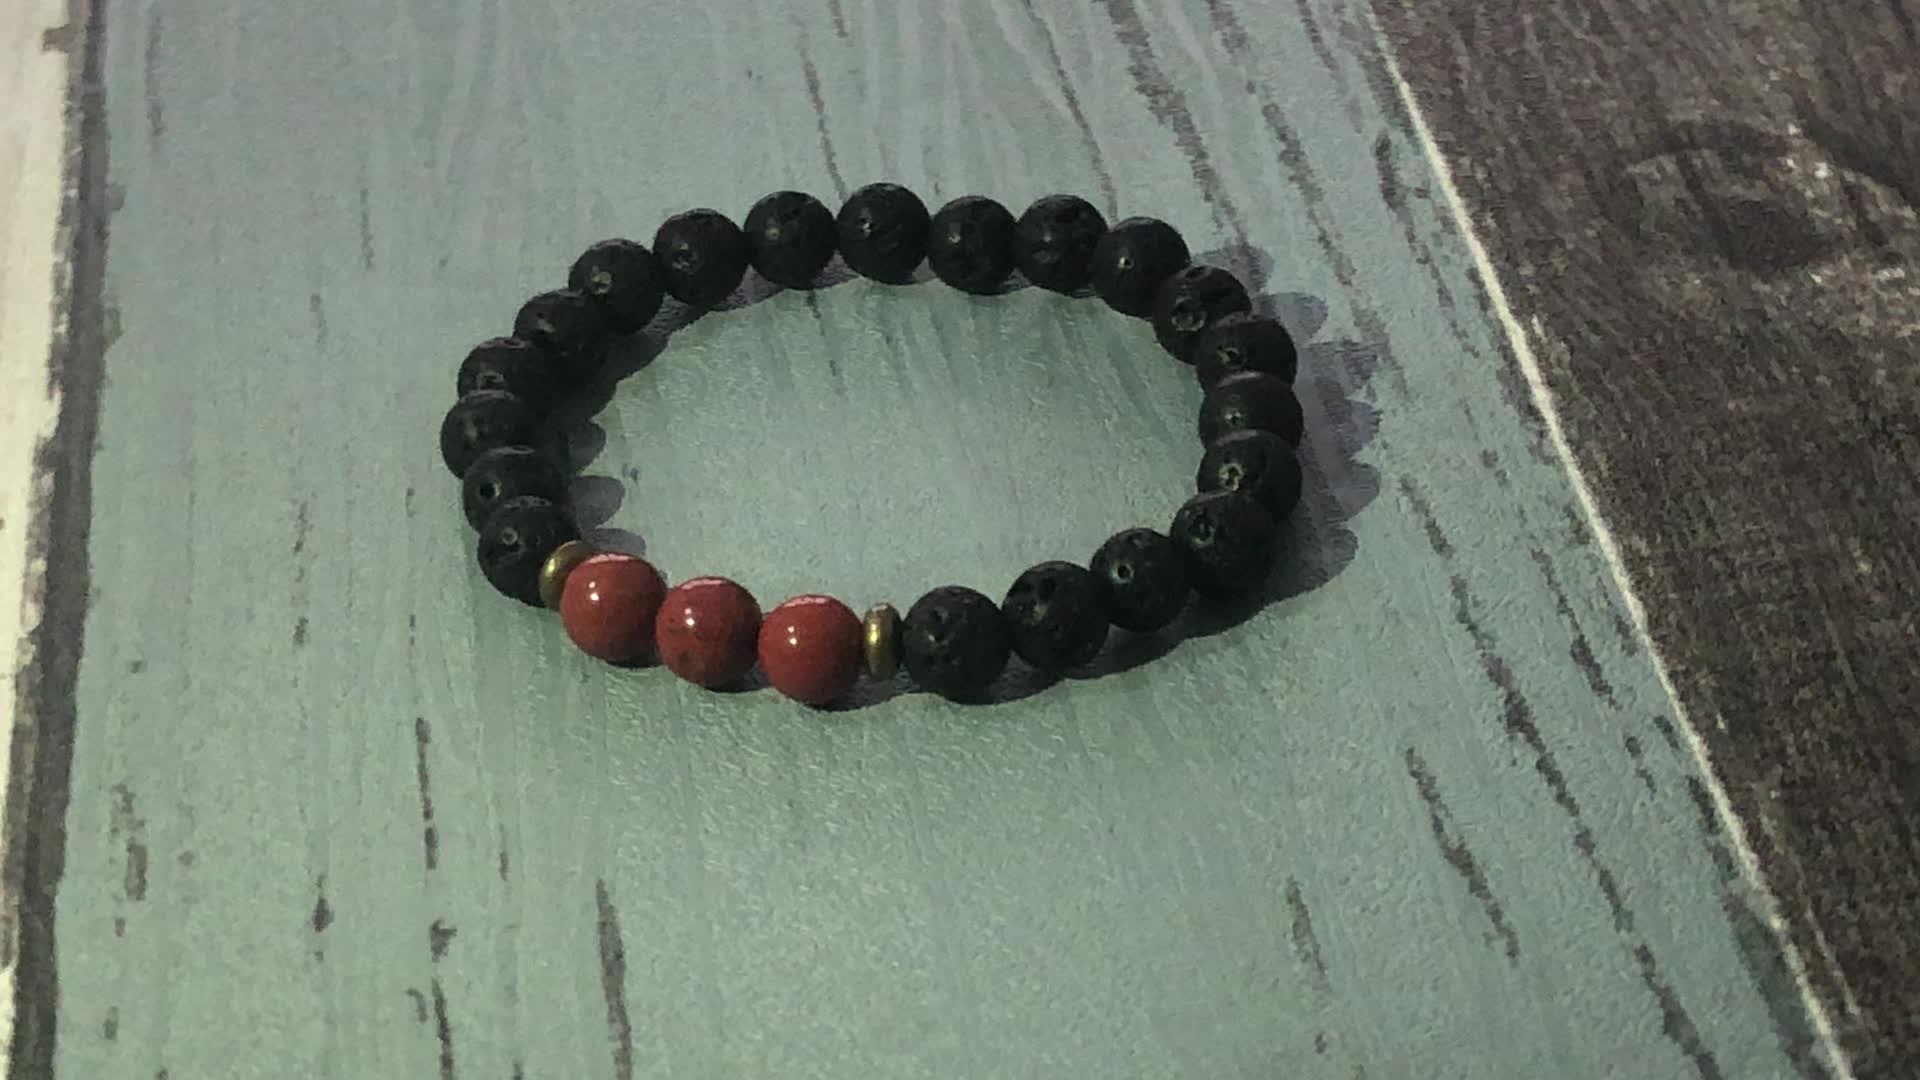 SN1731 Natural Stone Stretchy Jewelry 8mm Black Lava Stone Bracelet For Mens 8mm Stone Beads Meditation Bracelet Mala Jewelry